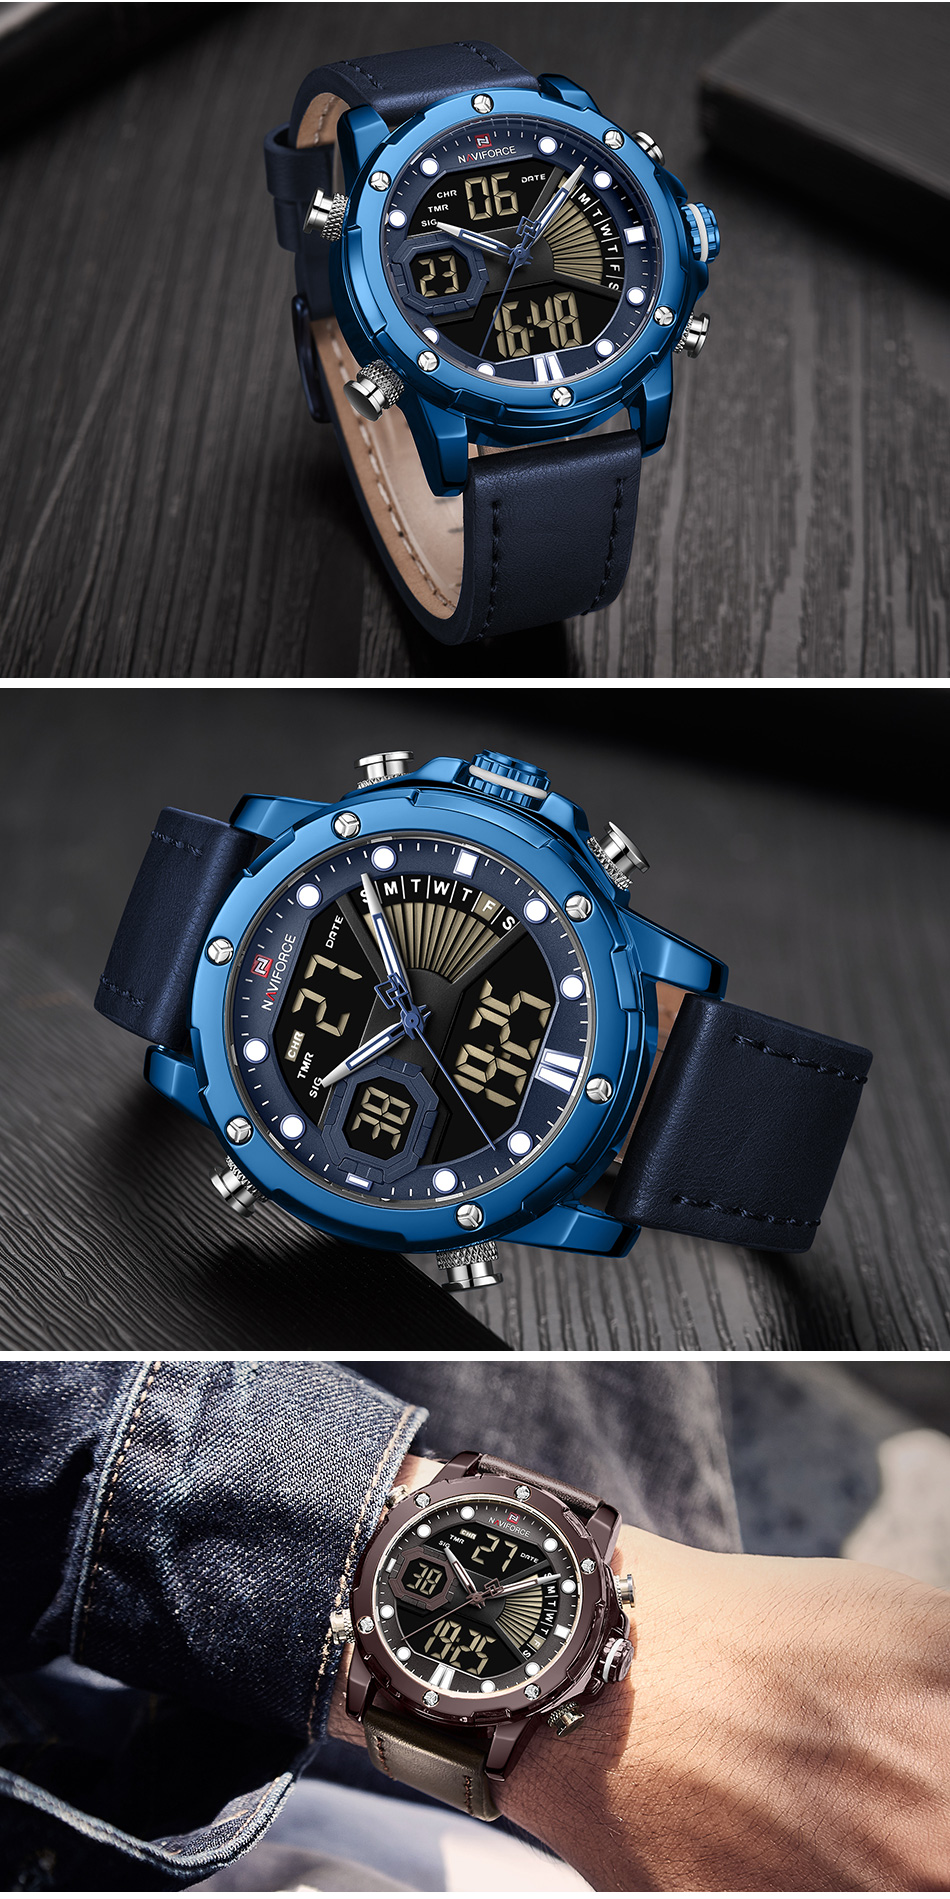 Hb96b0f10dc6747abad4c98bbe535f329L NAVIFORCE Men Watch Top Luxury Brand Fashion Sports Wristwatch